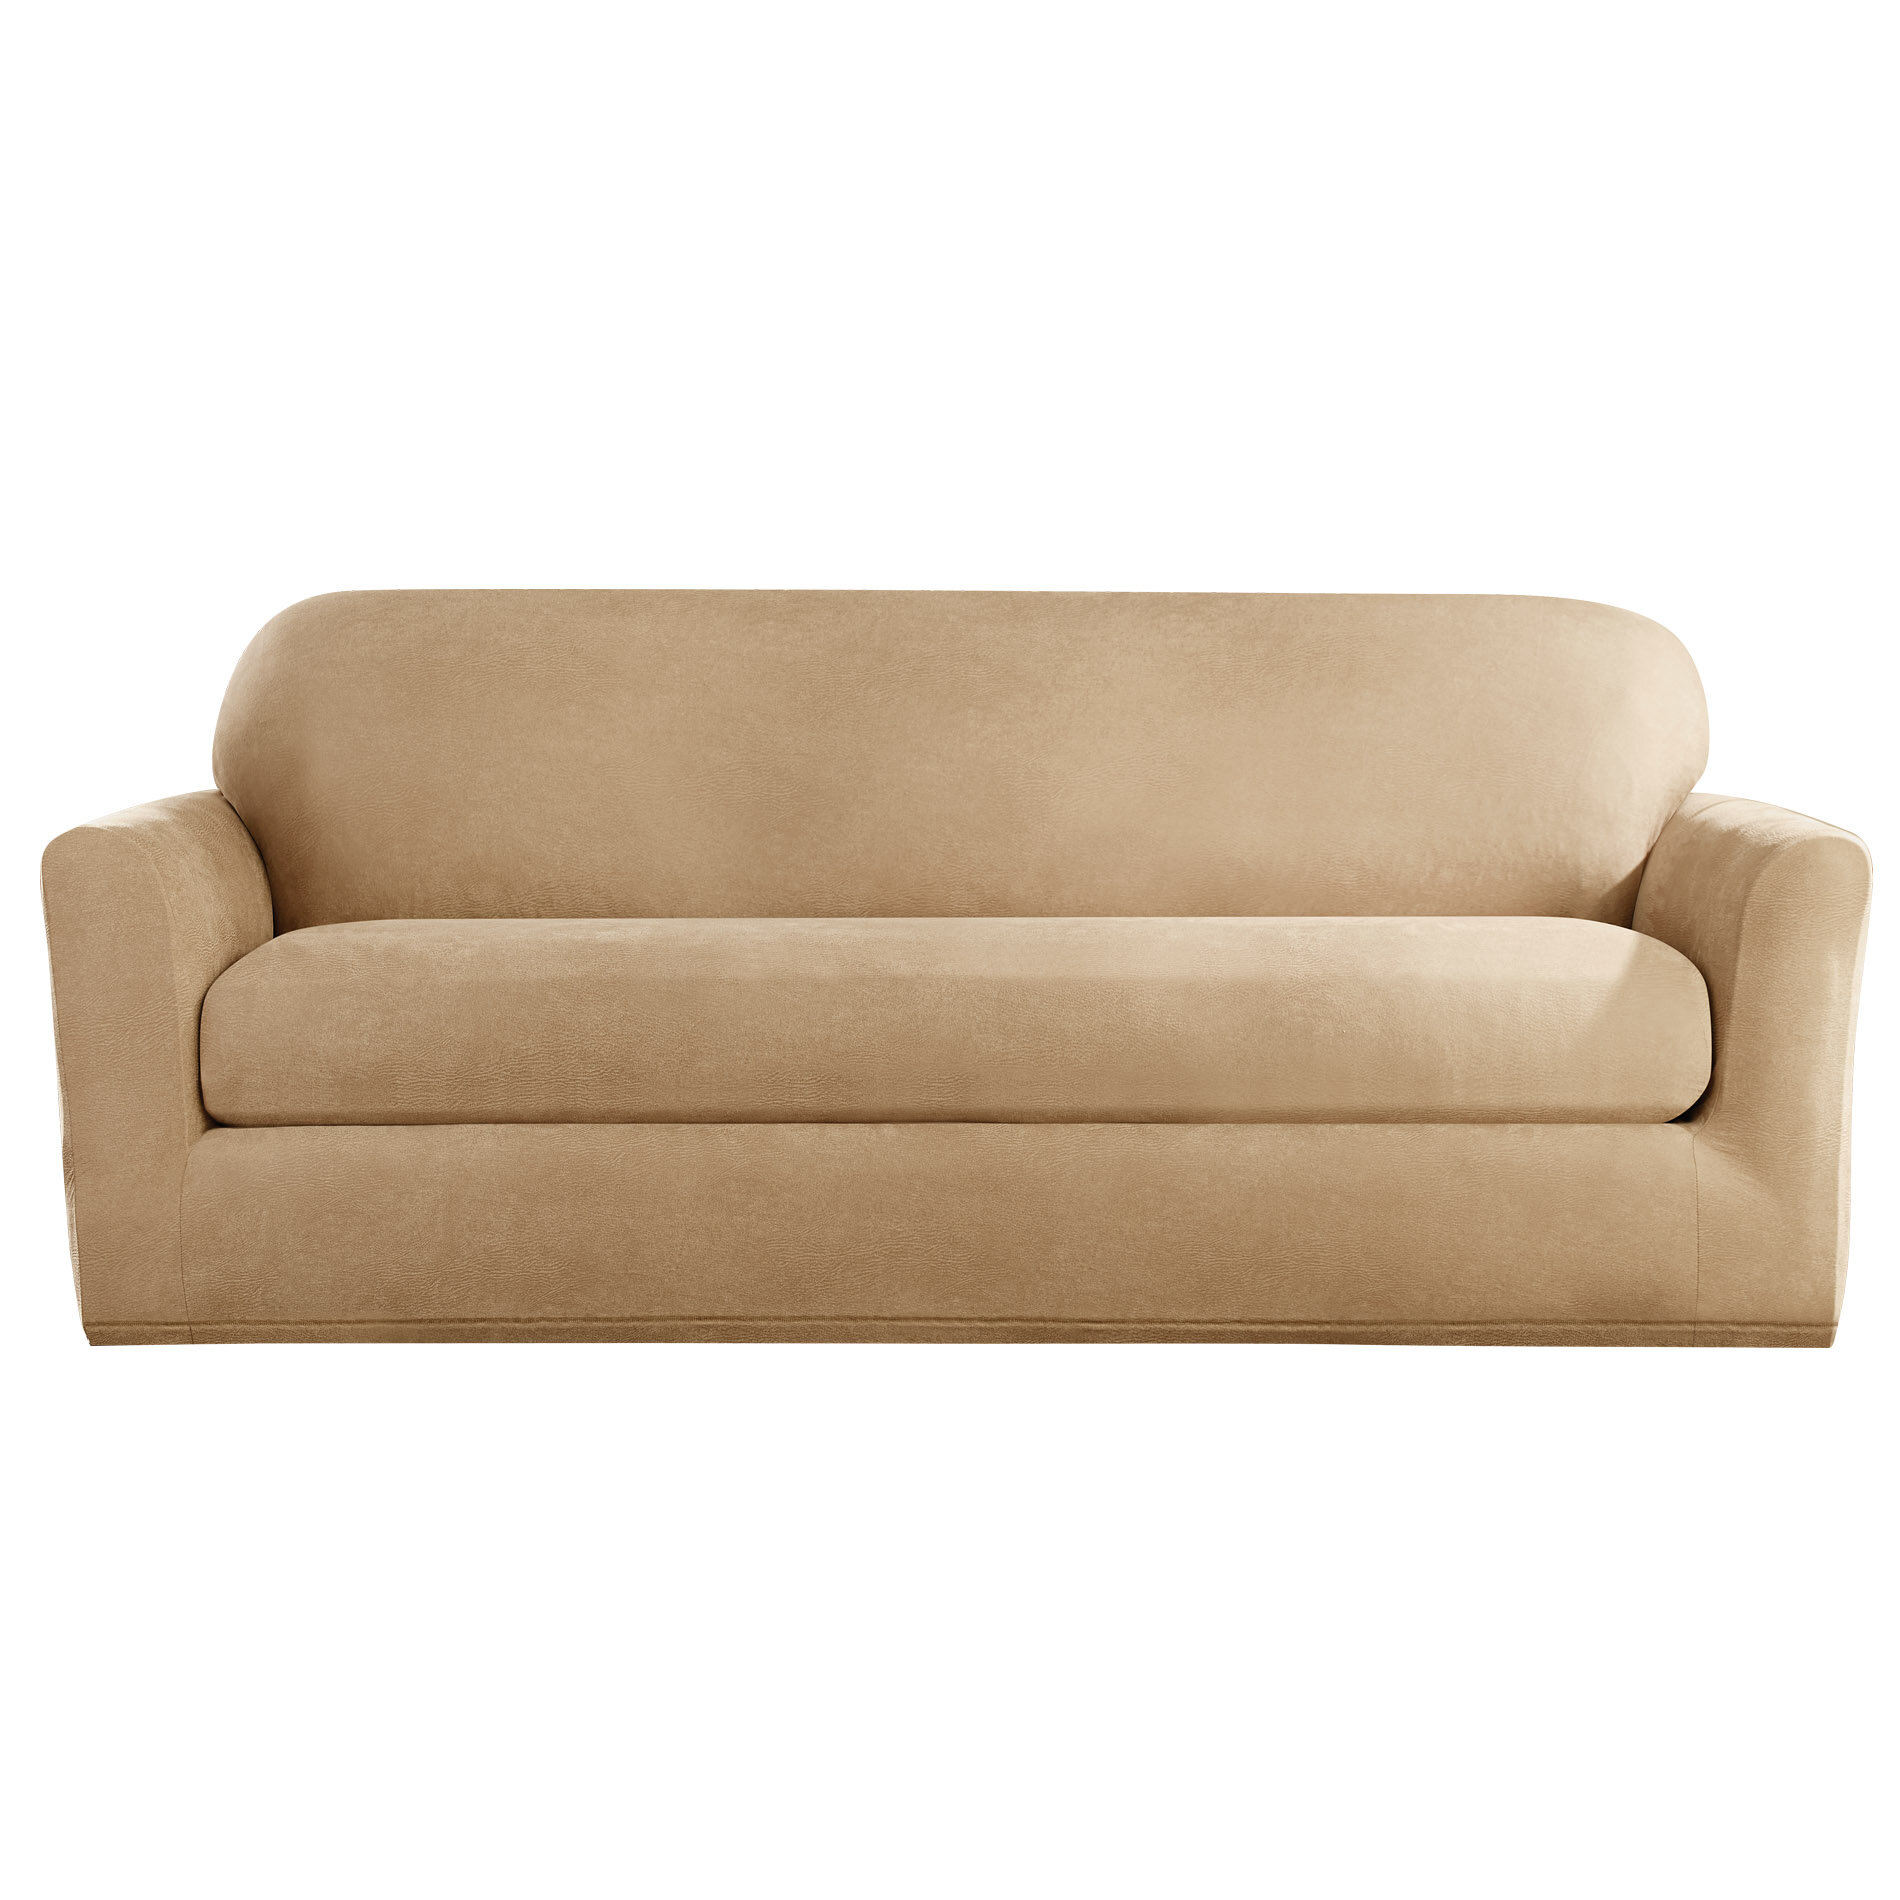 Sure Fit Stretch Leather Box Cushion Sofa Slipcover | Wayfair